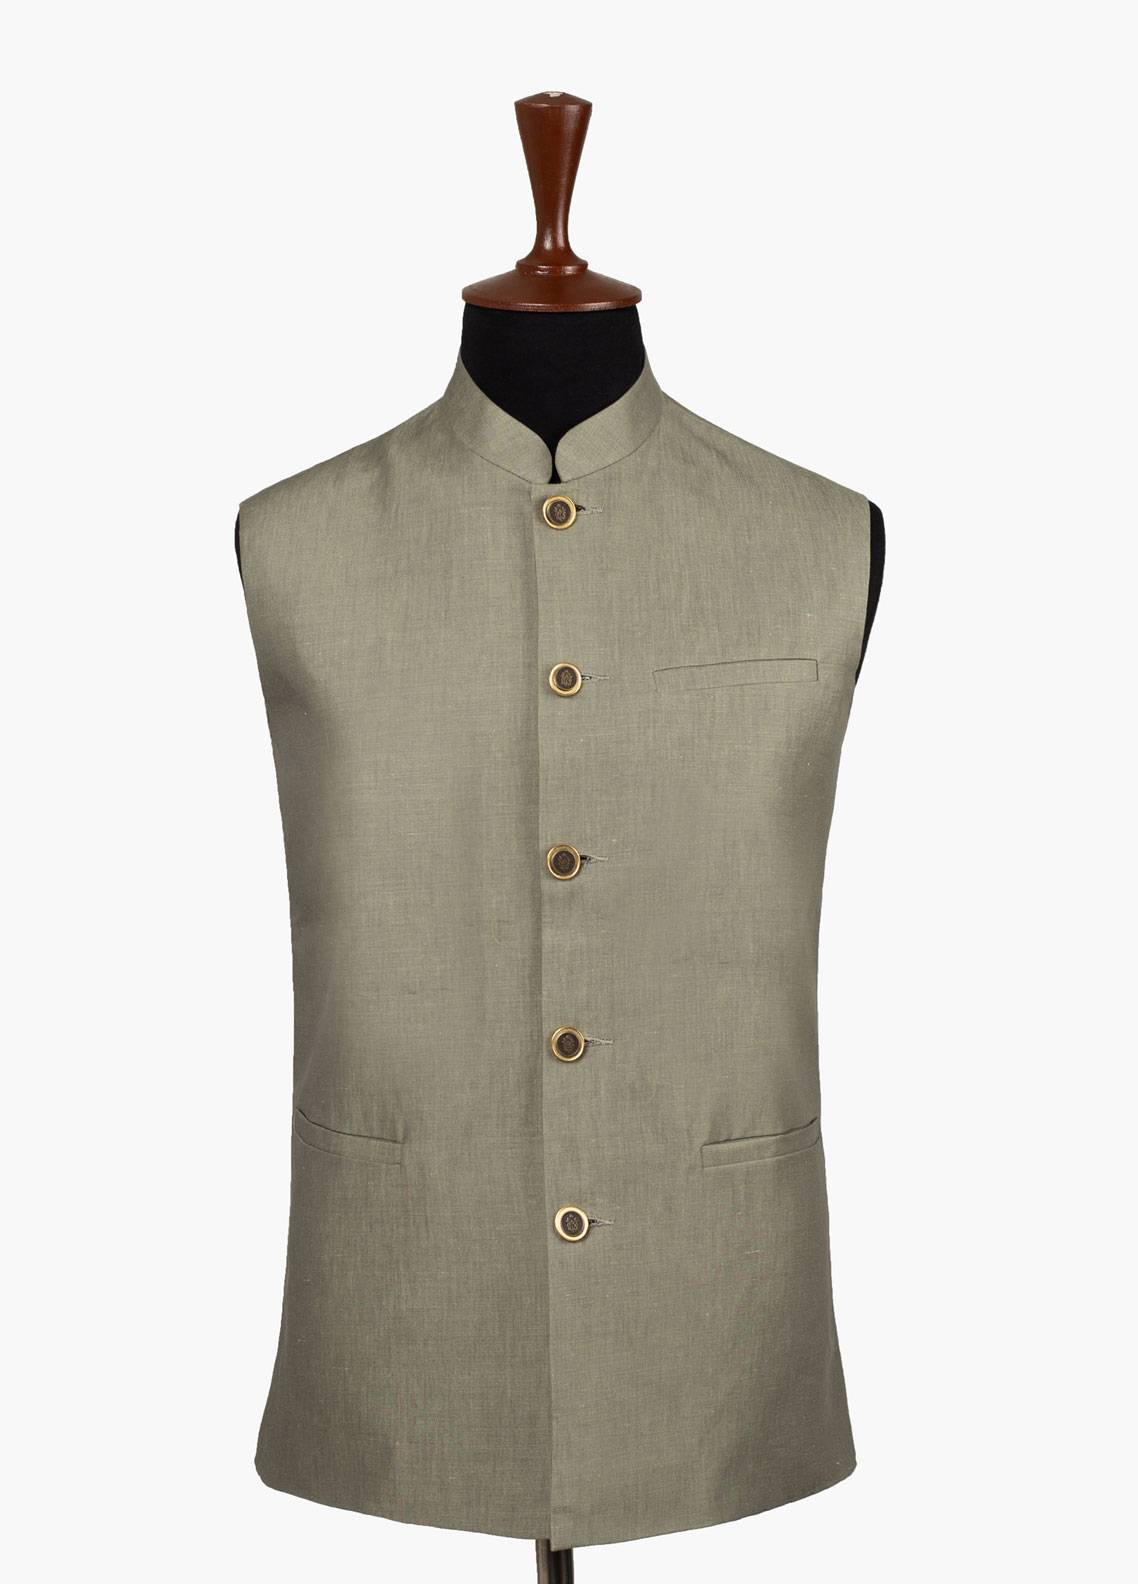 Brumano Linen Formal Waistcoat for Men - Green BRM-531